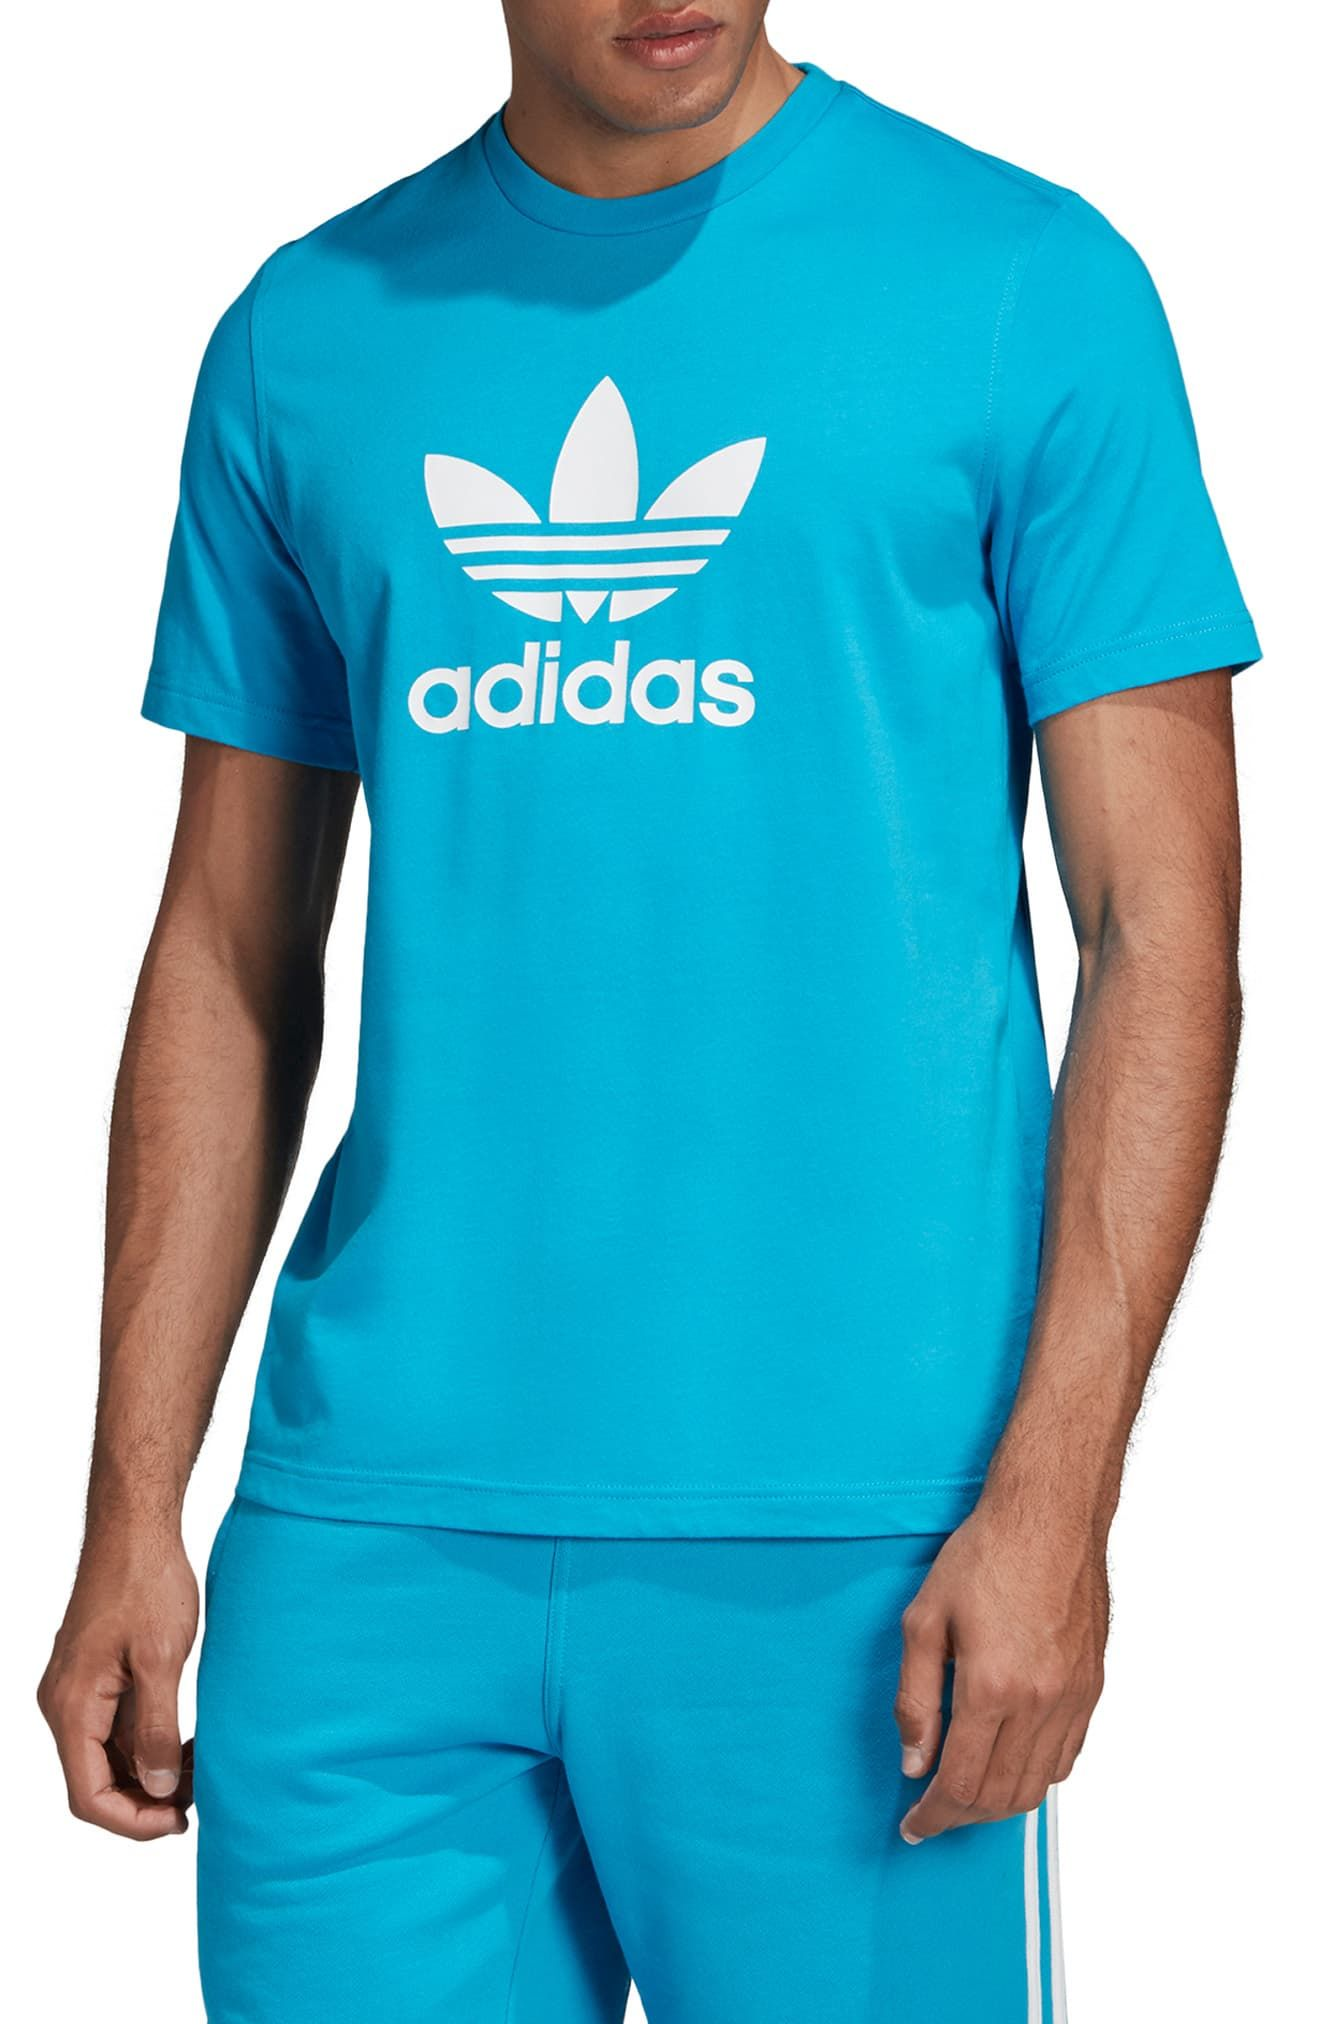 7ce7ea77 Men's Adidas Originals Trefoil Graphic T-Shirt, Size Small - Orange ...